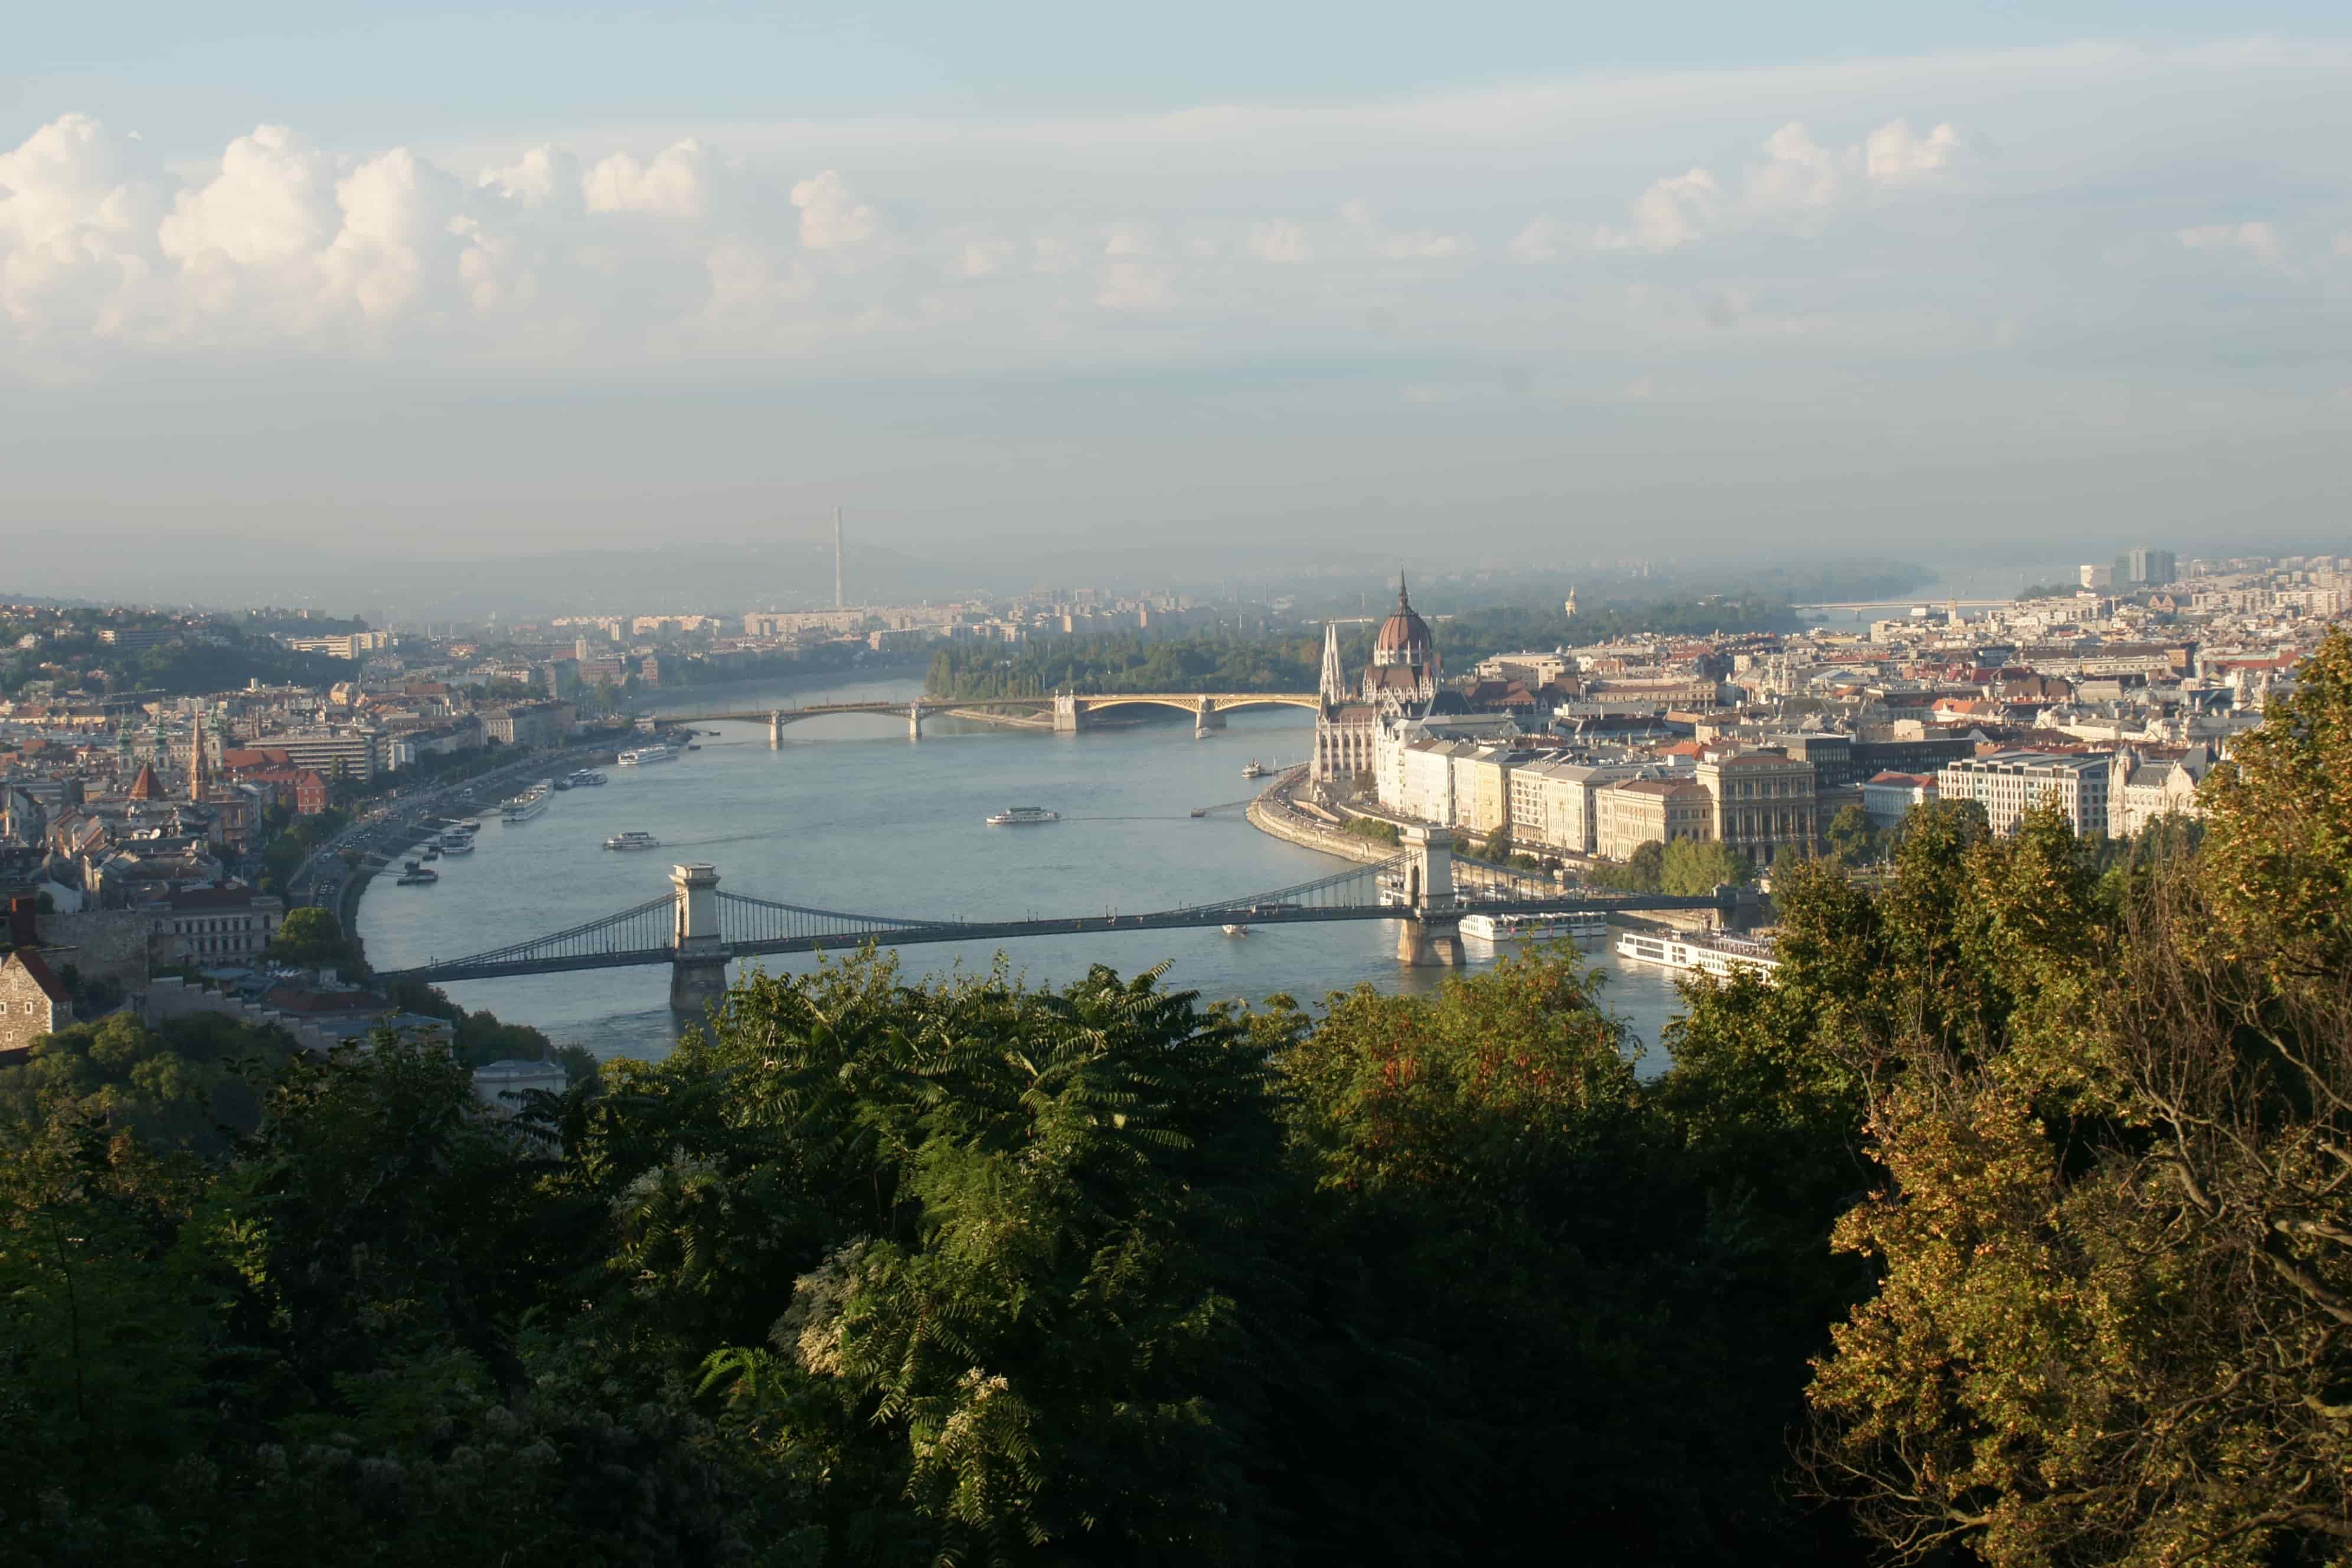 budapesta__podul_cu_lan__uri_peste_dun__re-min